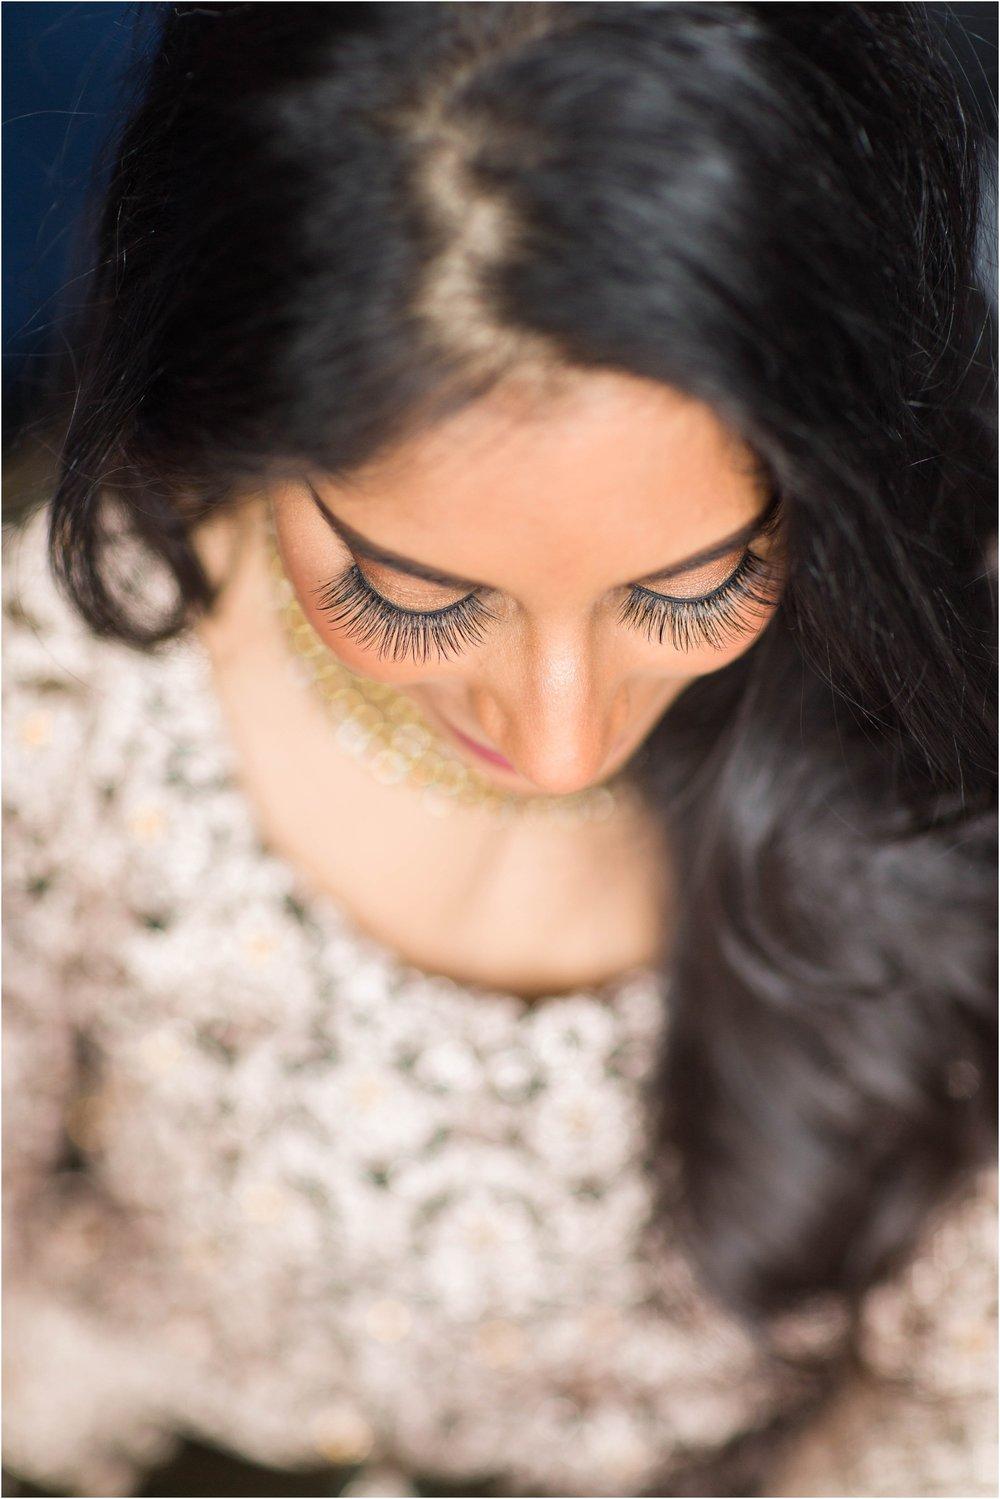 Mint-Room-Studios-Anniversary-Session-Toronto-Mississauga-Brampton-Scarborough-GTA-Pakistani-Indian-Wedding-Engagement-Photographer-Photography_0039.jpg